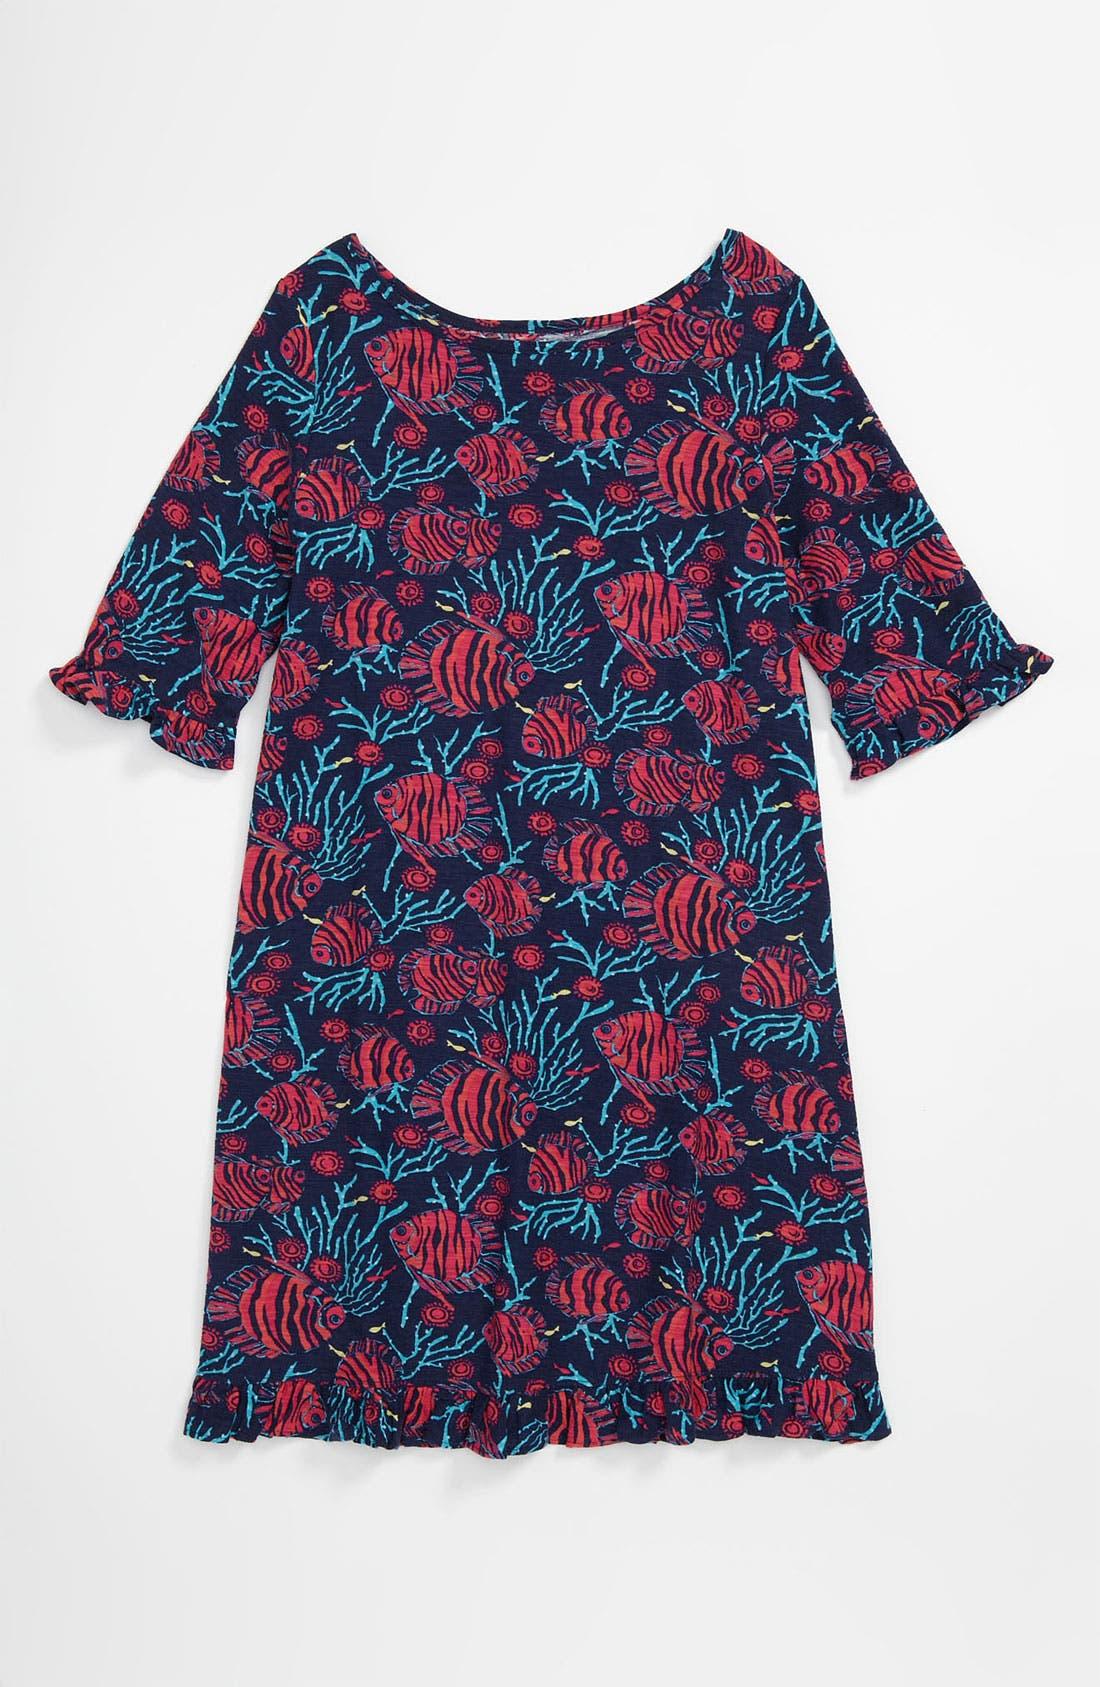 Main Image - Lilly Pulitzer® 'Linney' Dress (Little Girls & Big Girls)